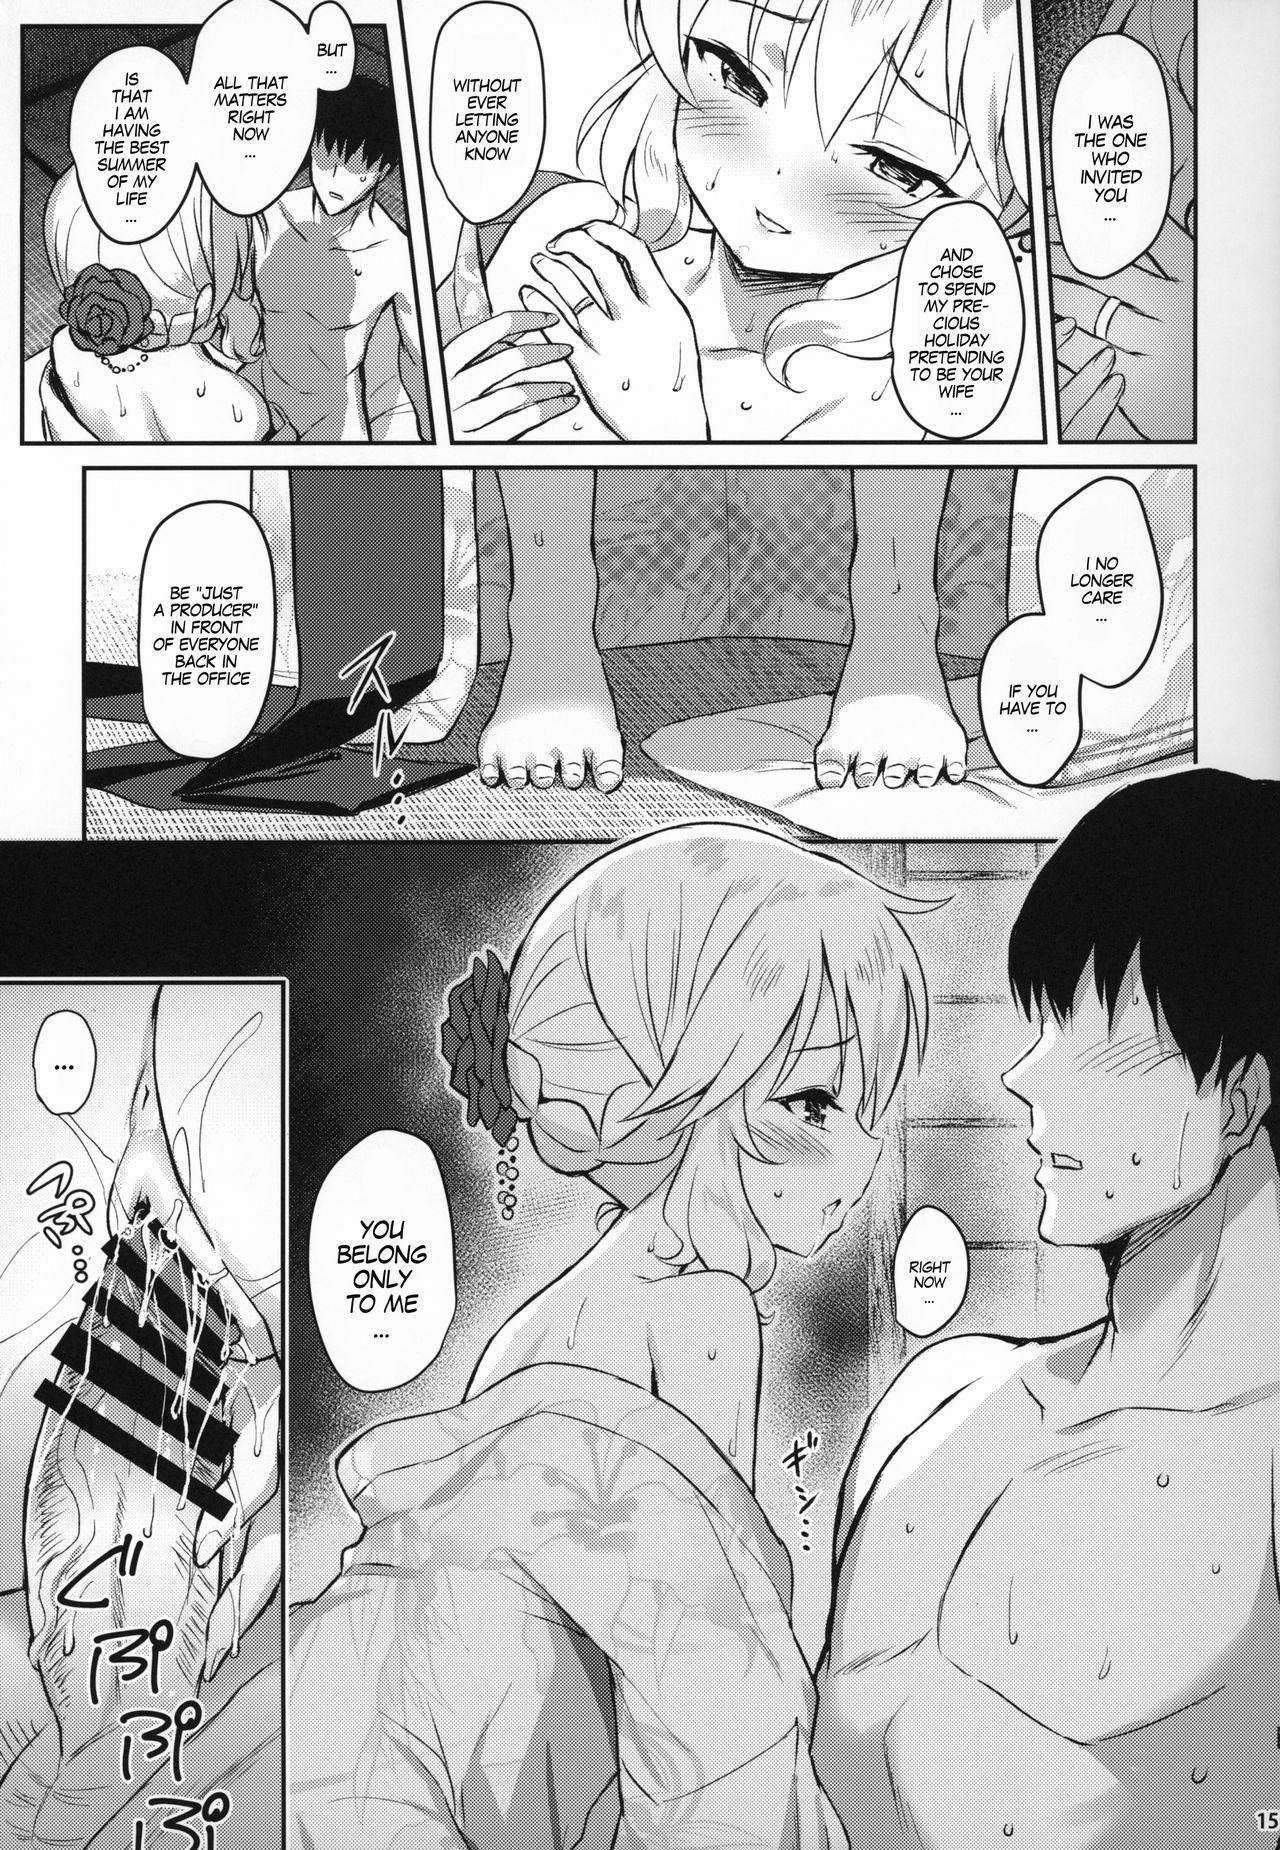 Momoka Yoitsuma 2 | Sweet Wife Momoka 2 13